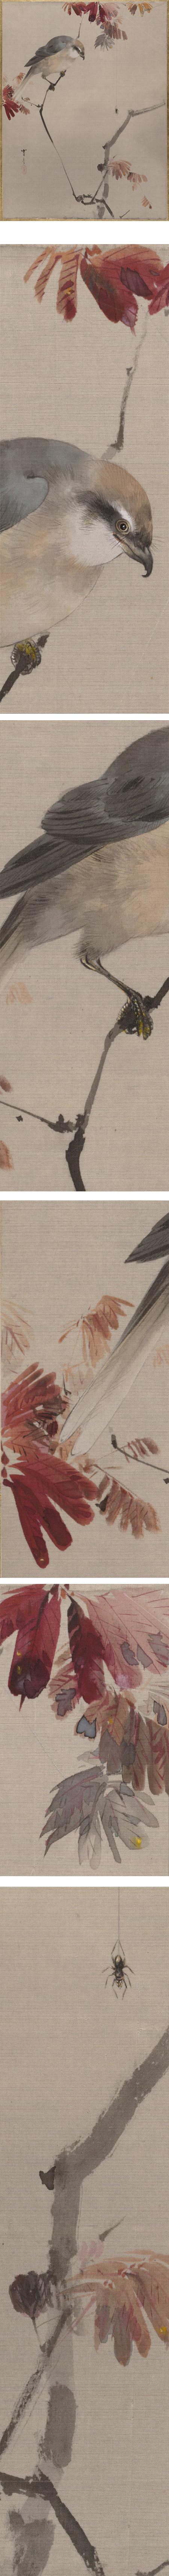 Bird on Branch Watching Spider, Watanabe Seitei, ink and color on silk